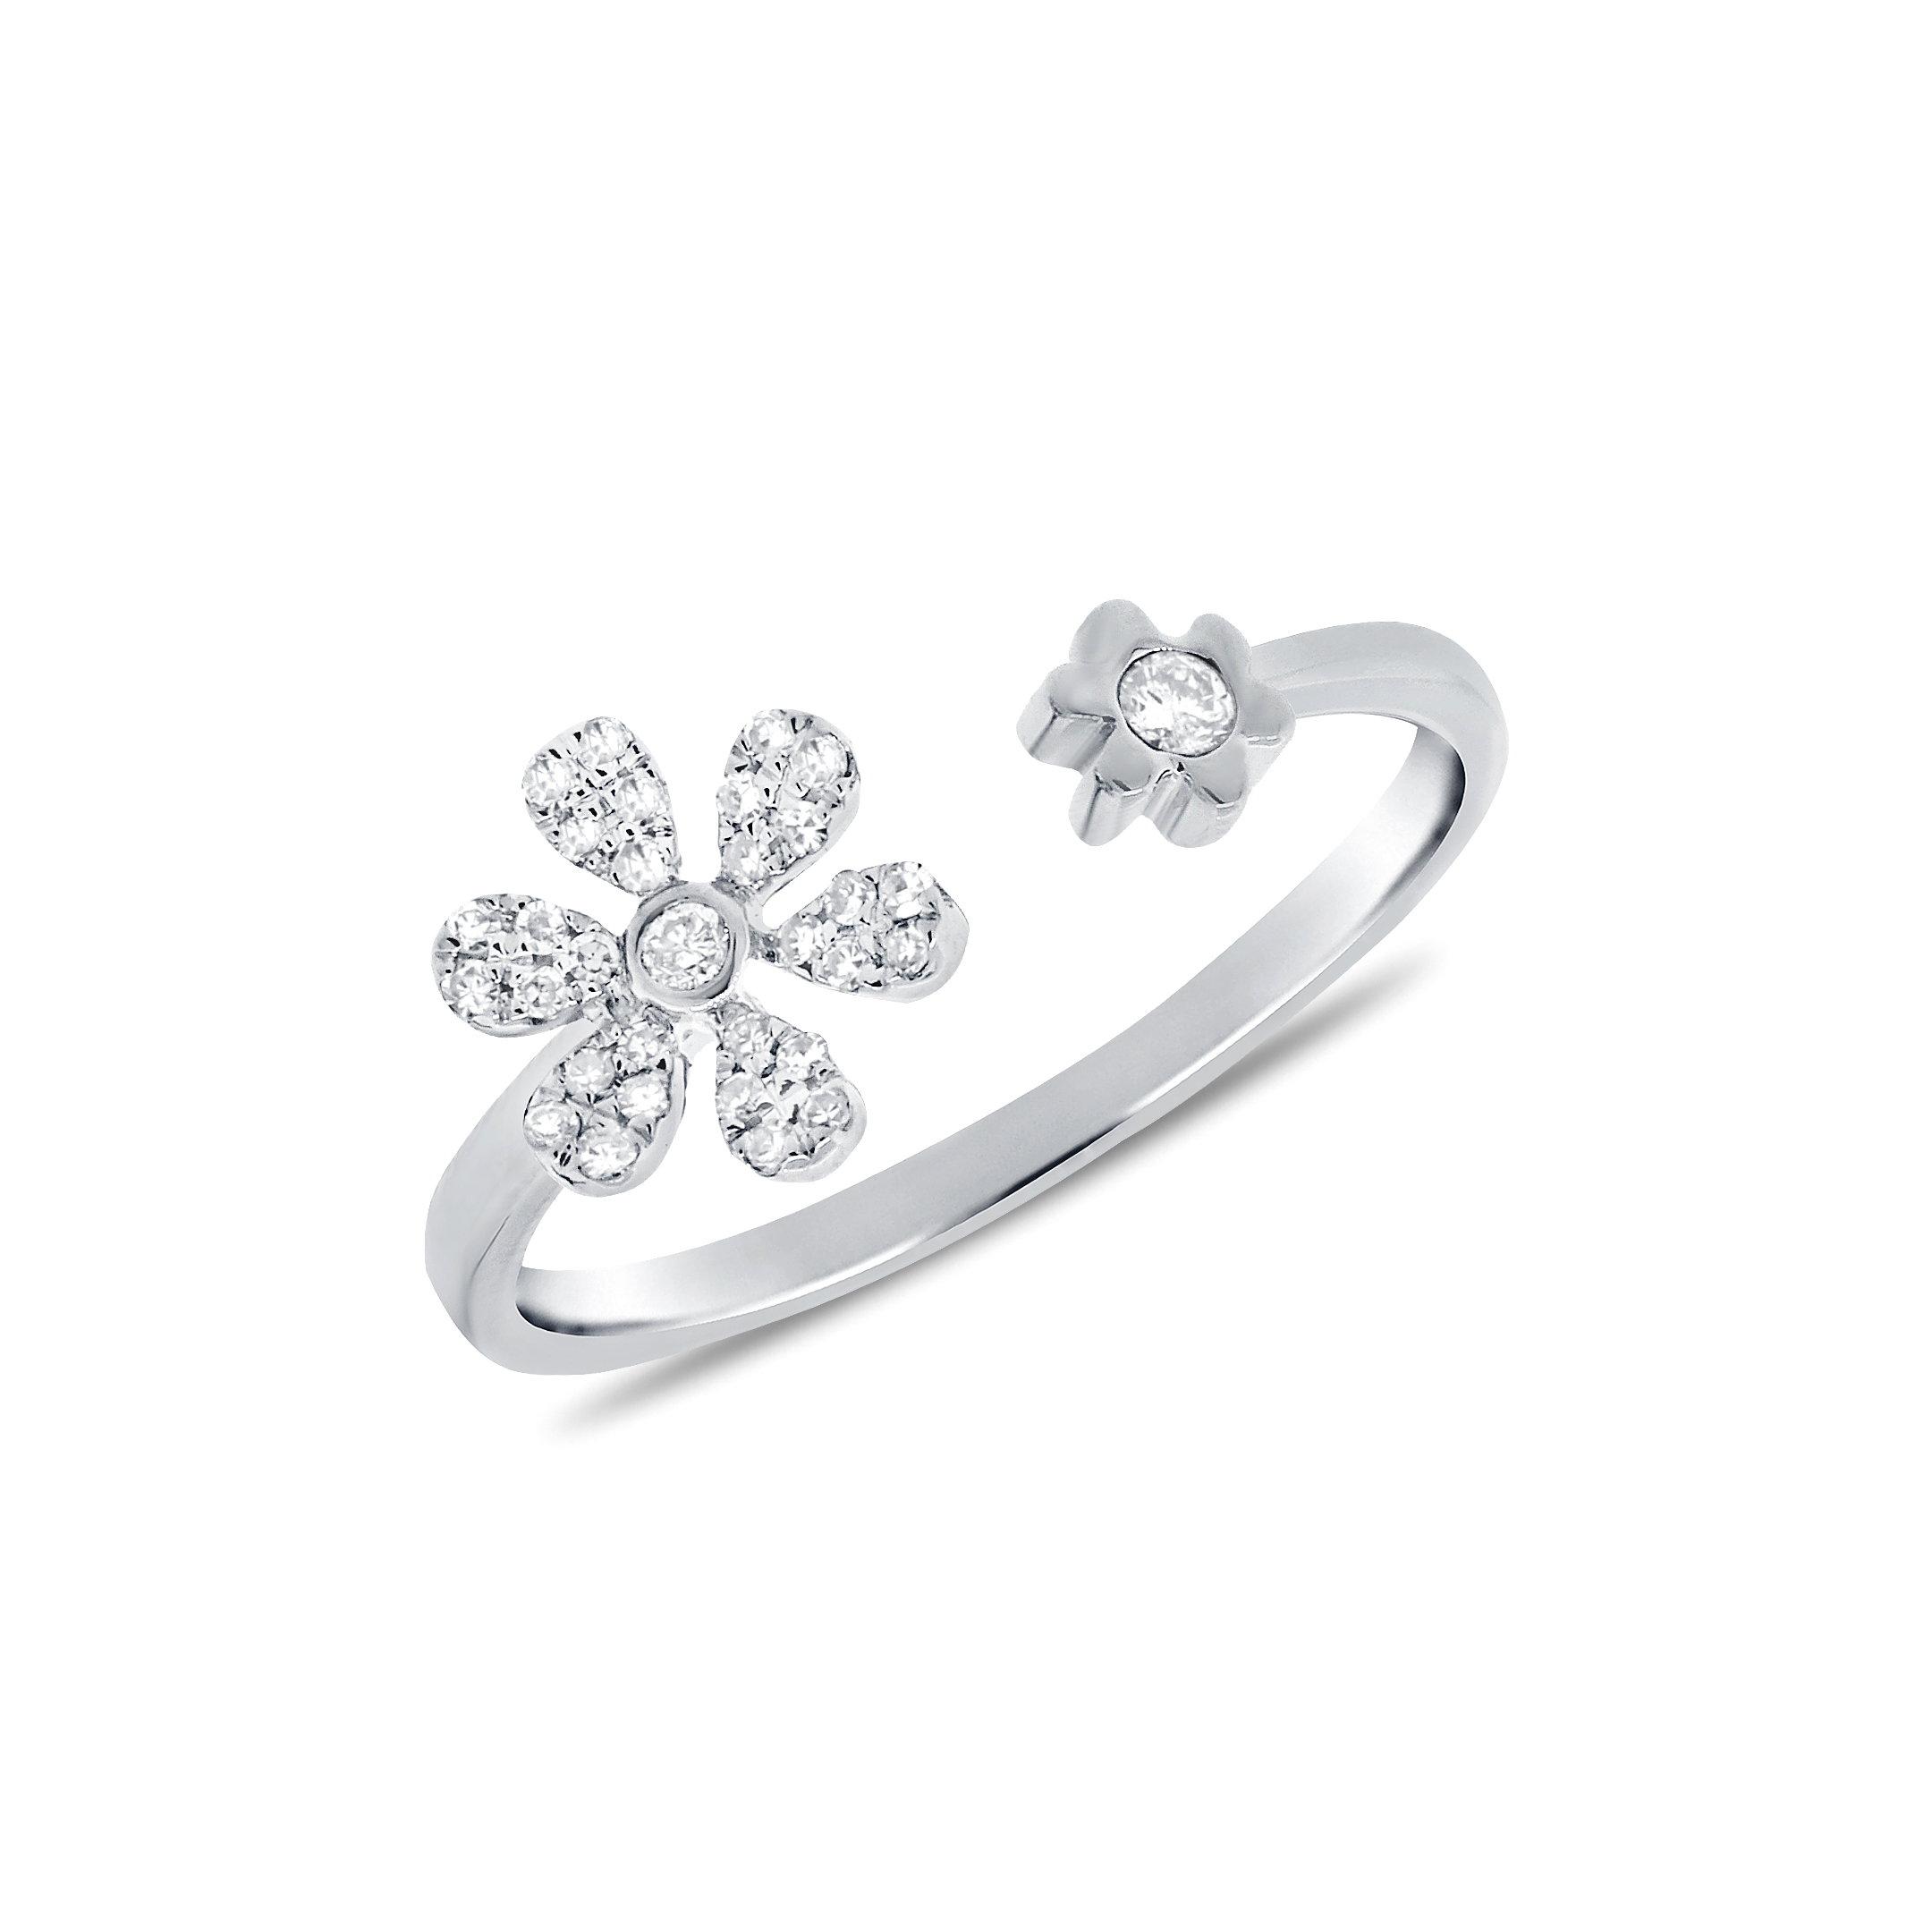 Diamond Daisy Petal Ring in 14k White Gold